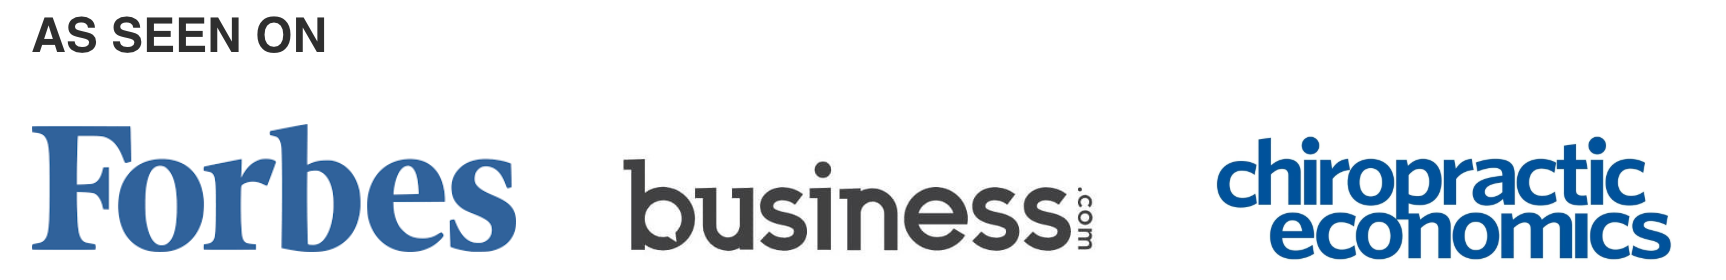 Forbes, Business.com, chiropractic economics logos